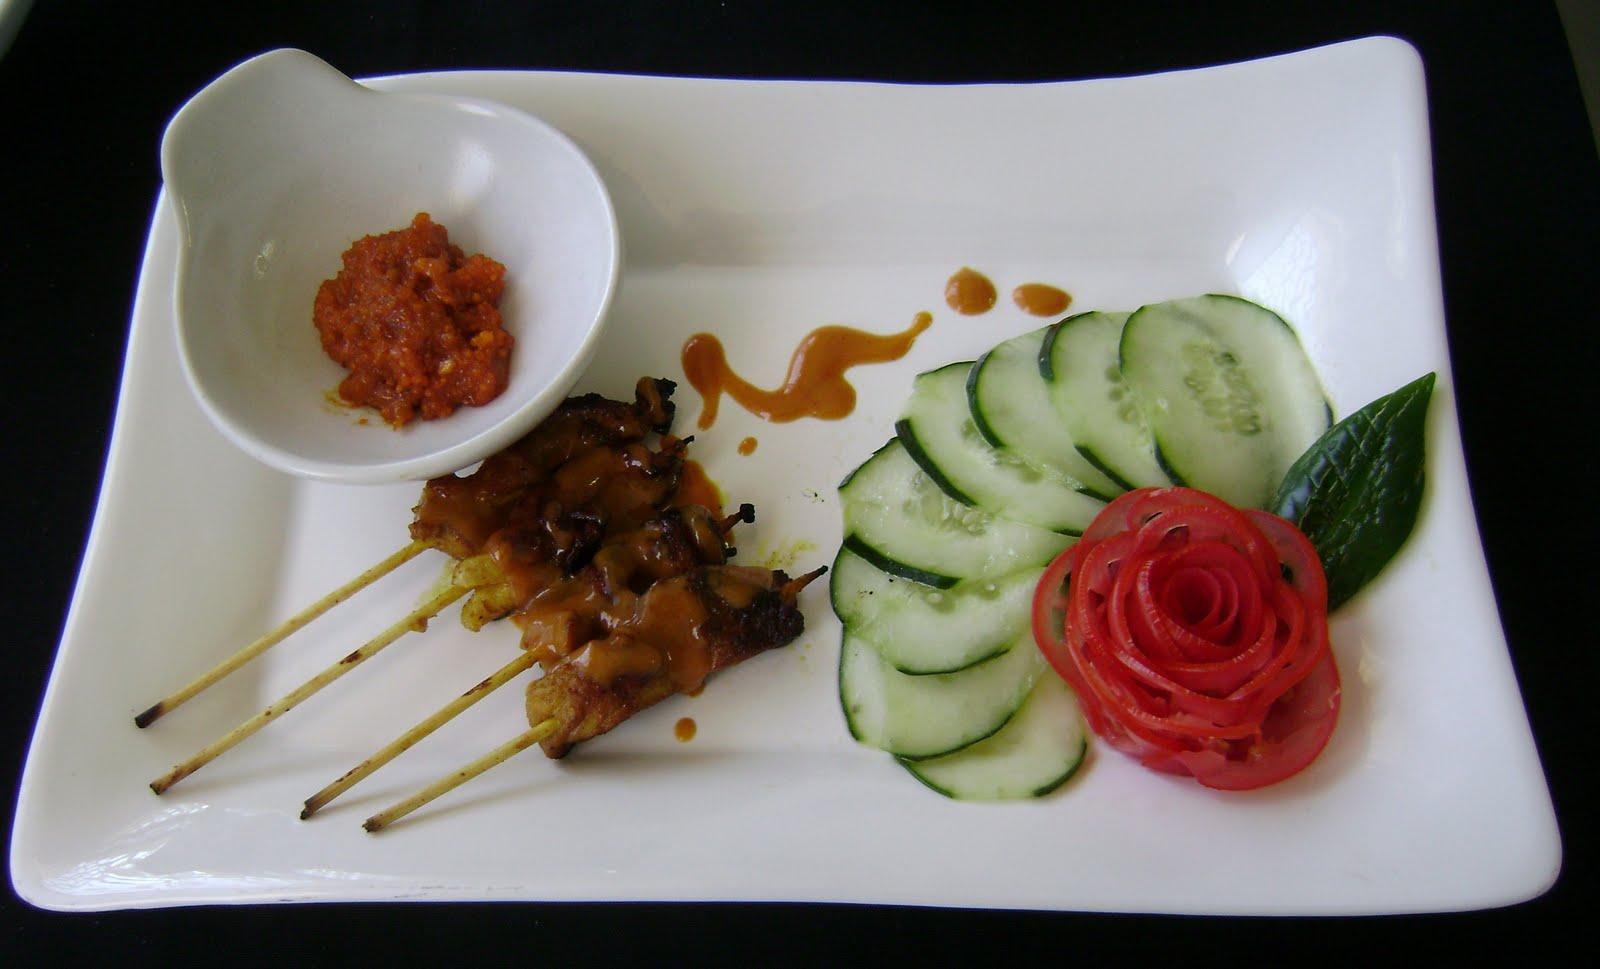 Thot kinji im genes de cocina tailandesa for Decoracion de platos gourmet pdf